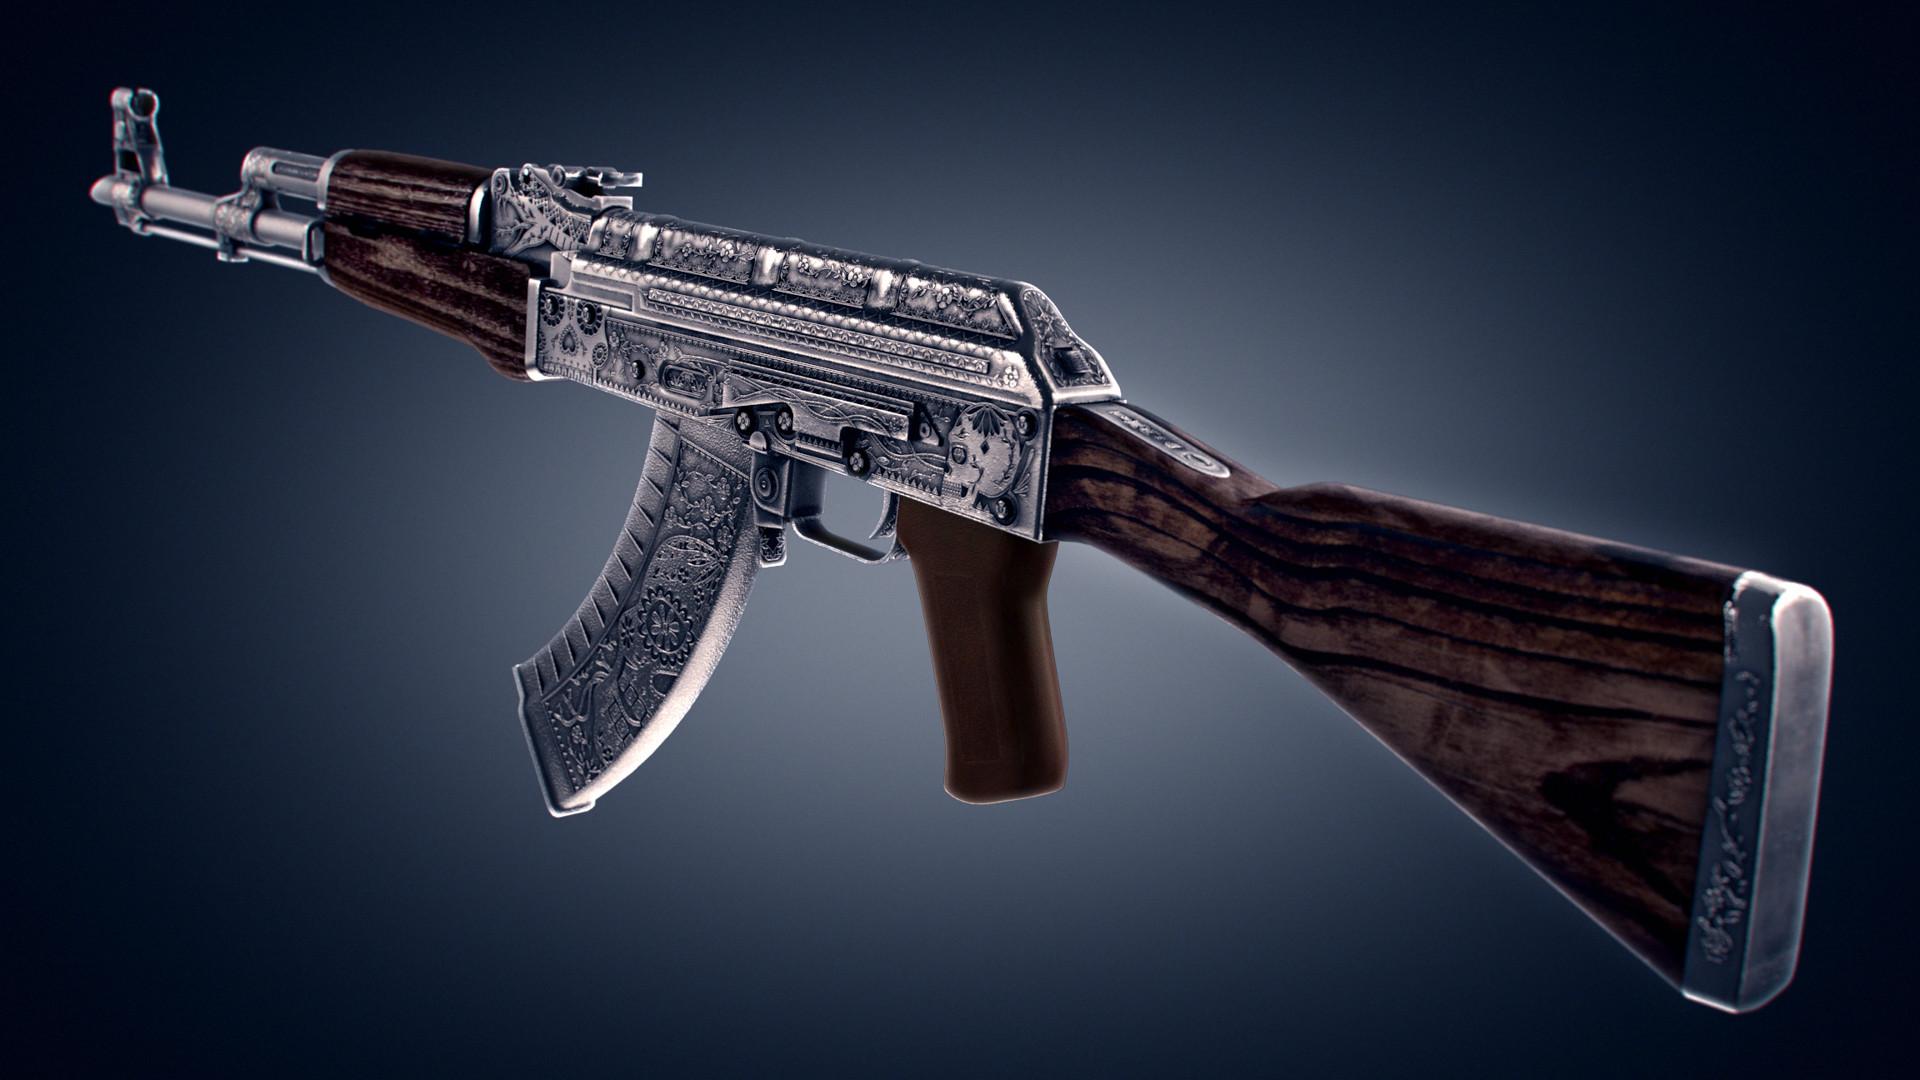 2560x1600 Ak 47 Rifle Wallpaper Pack 1080p Hd Daisy Walter 2017 03 20